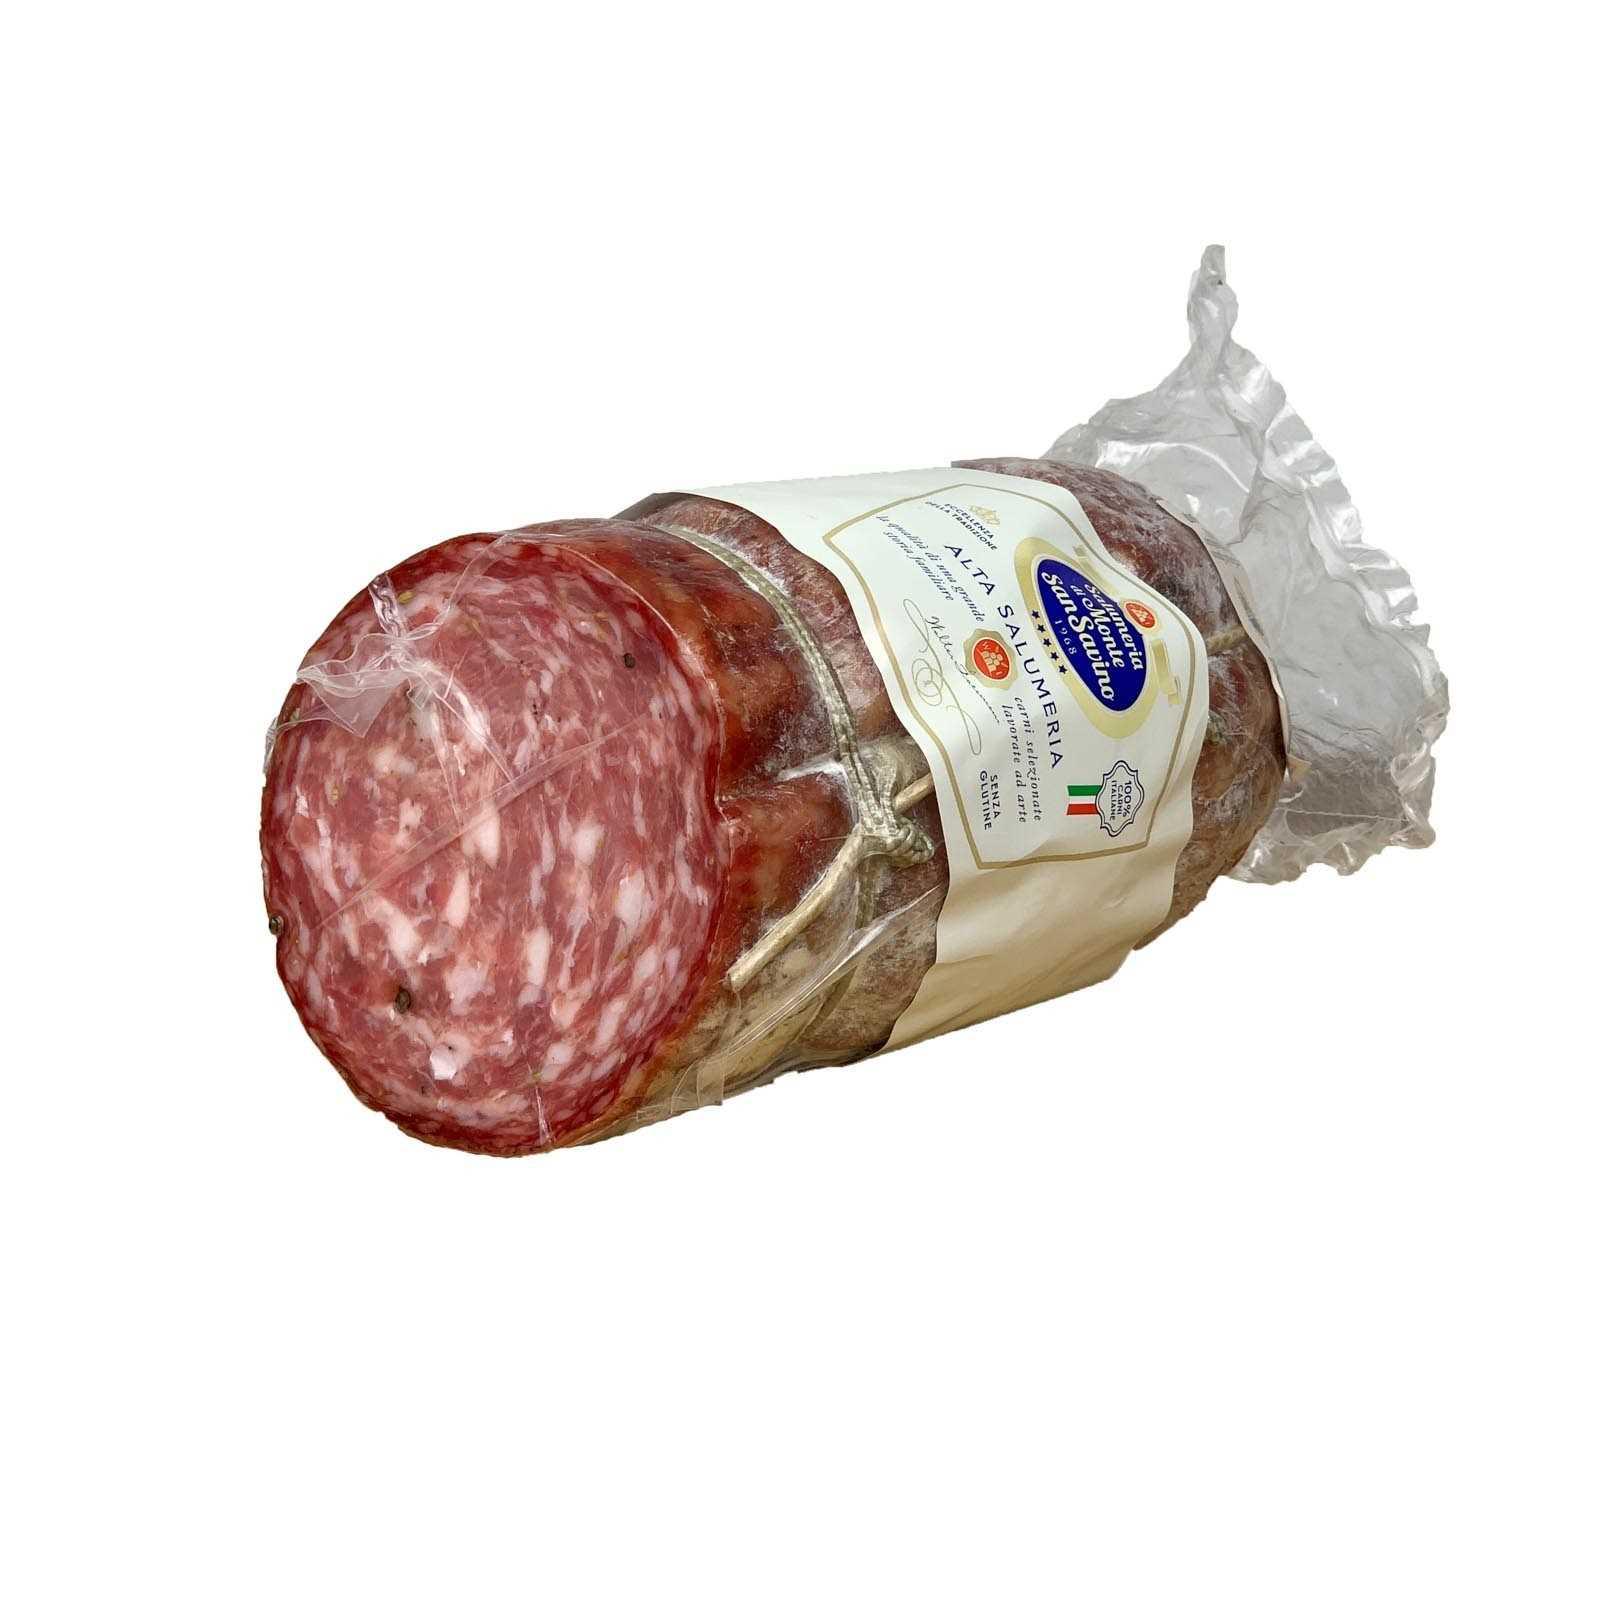 PGI Finocchiona (Fennel Seed Salami) - Large Vacuum-Packed Piece.